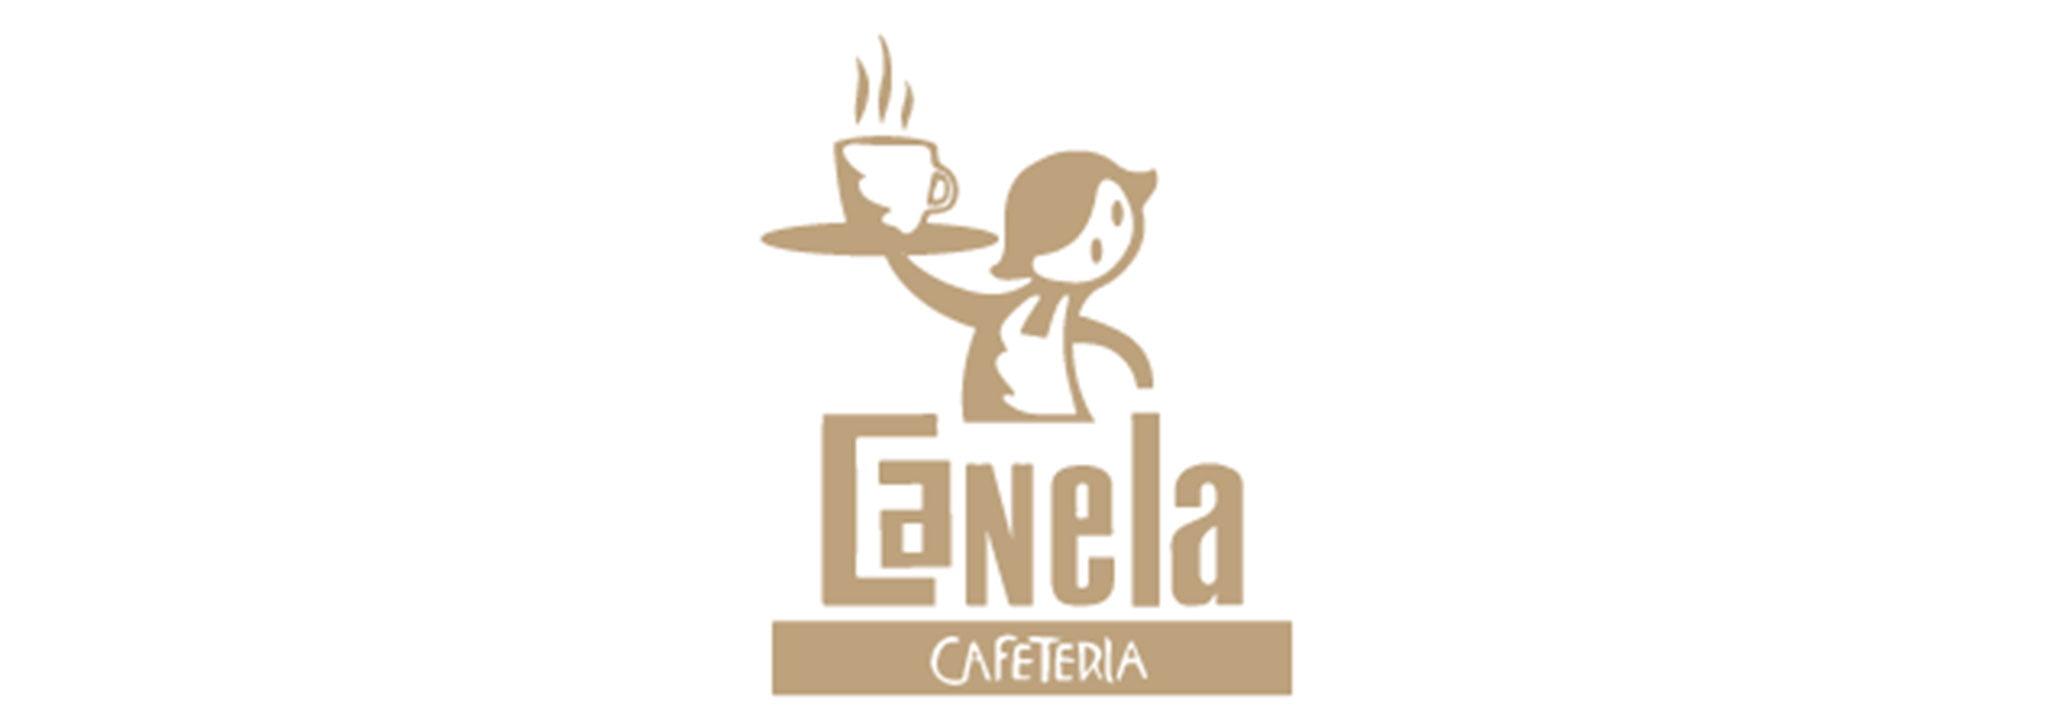 Logotipo de Canela